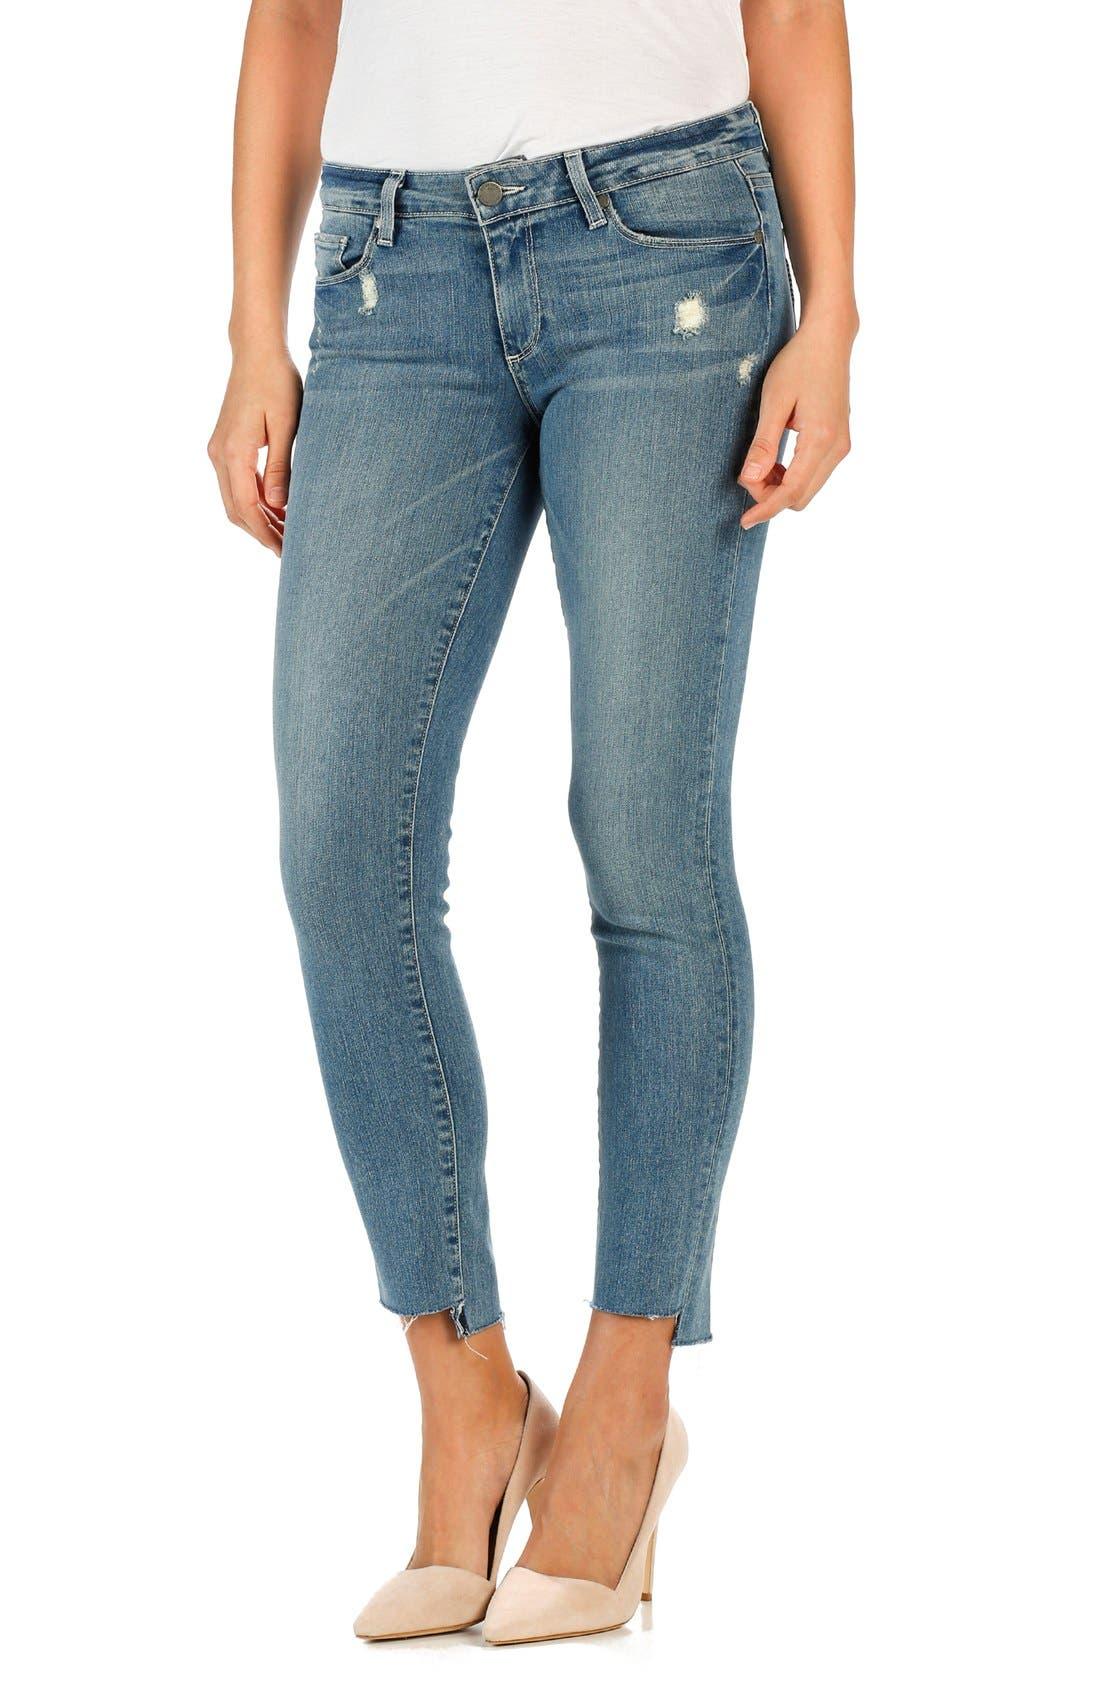 Main Image - PAIGE 'Skyline' Cutoff Ankle Peg Skinny Jeans (Wiley)